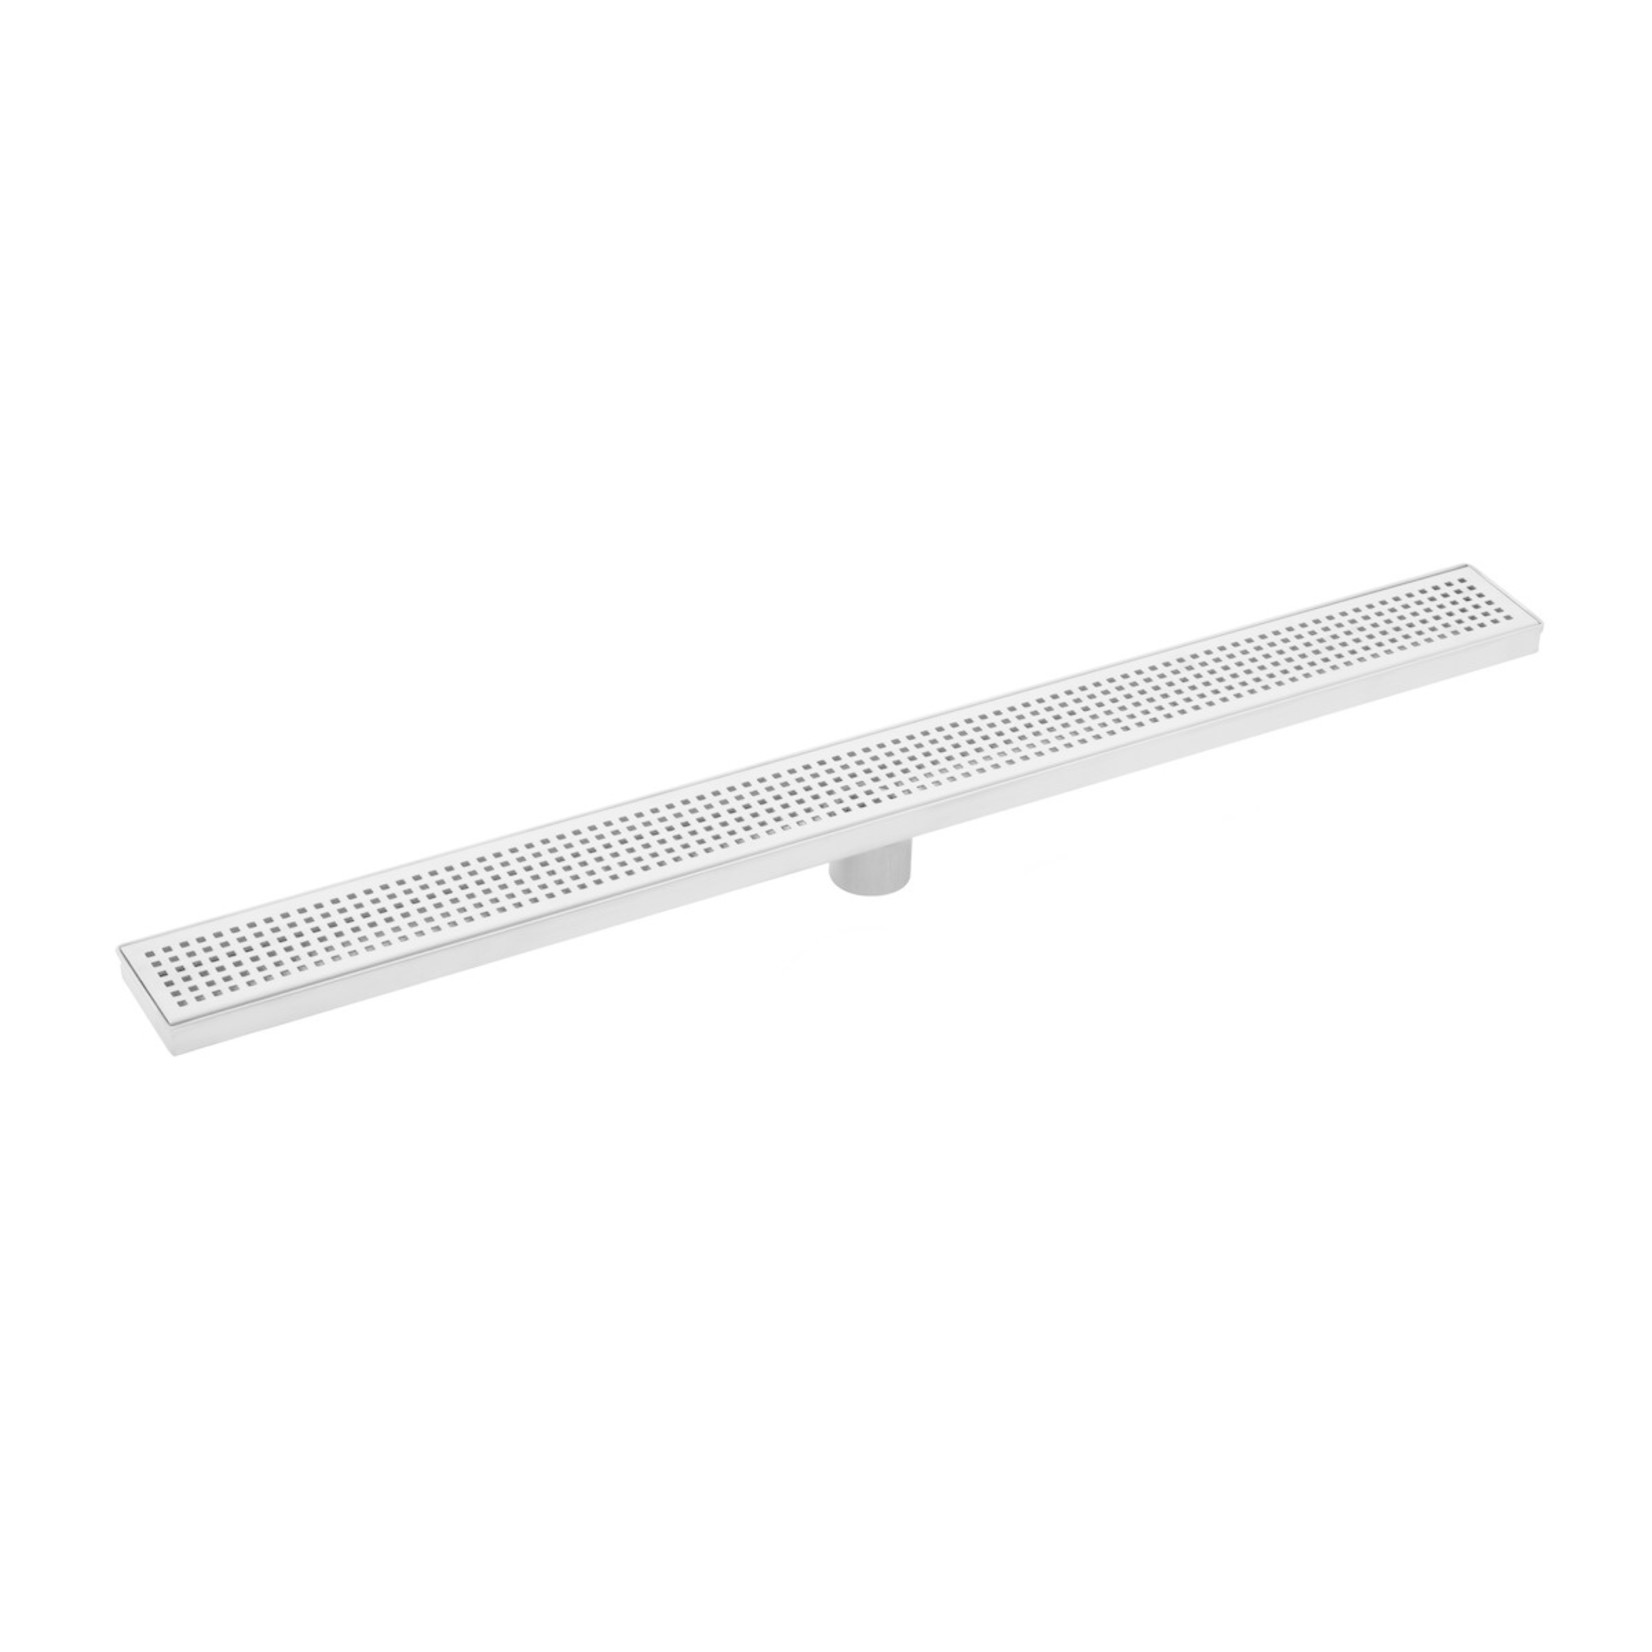 Stainless steel linear drain LBE model